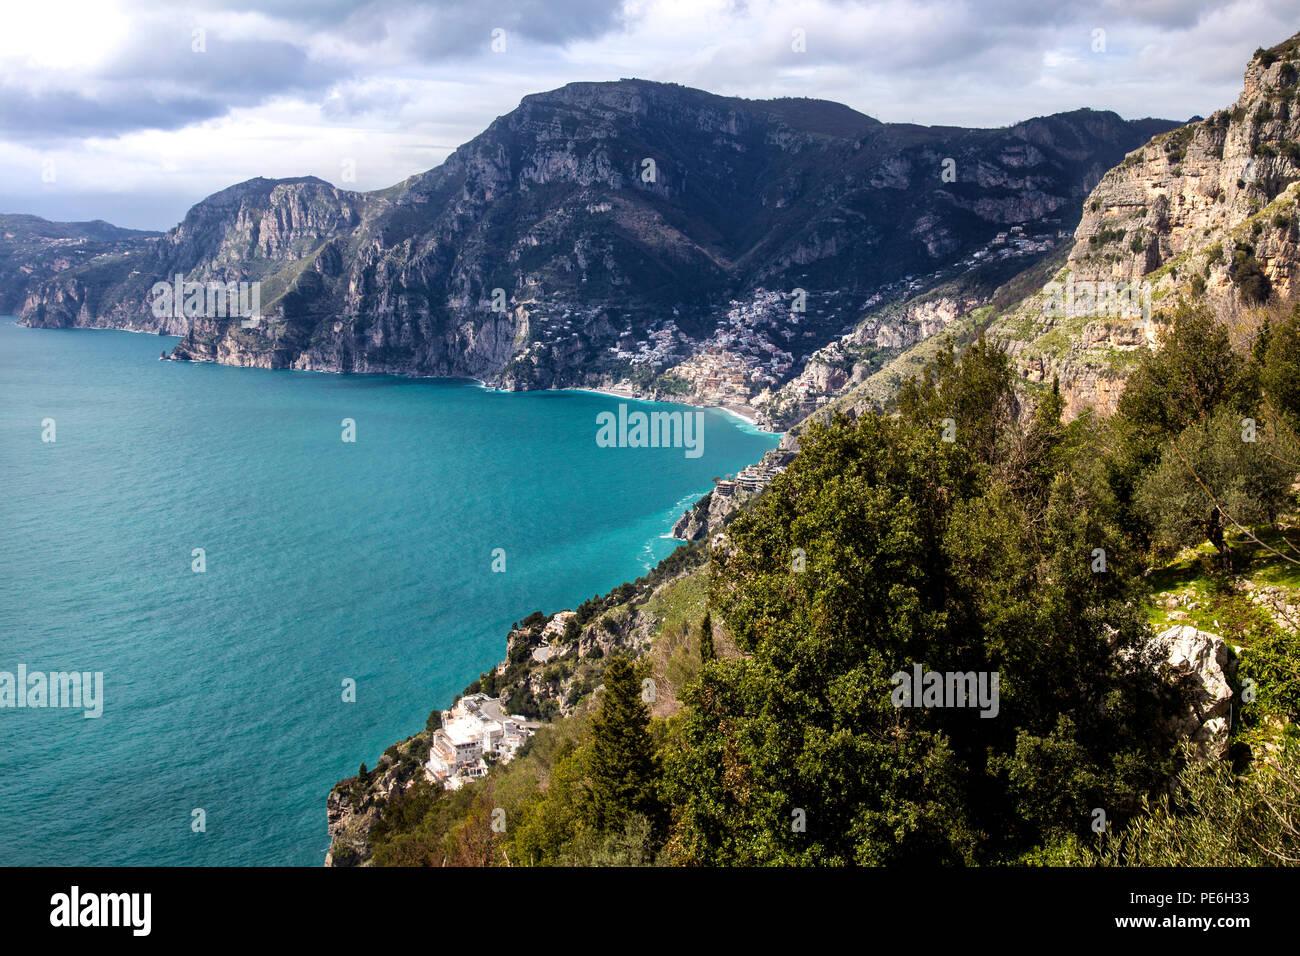 Sea and mountains near Praiano in the Amalfi Coast, Italy - Stock Image